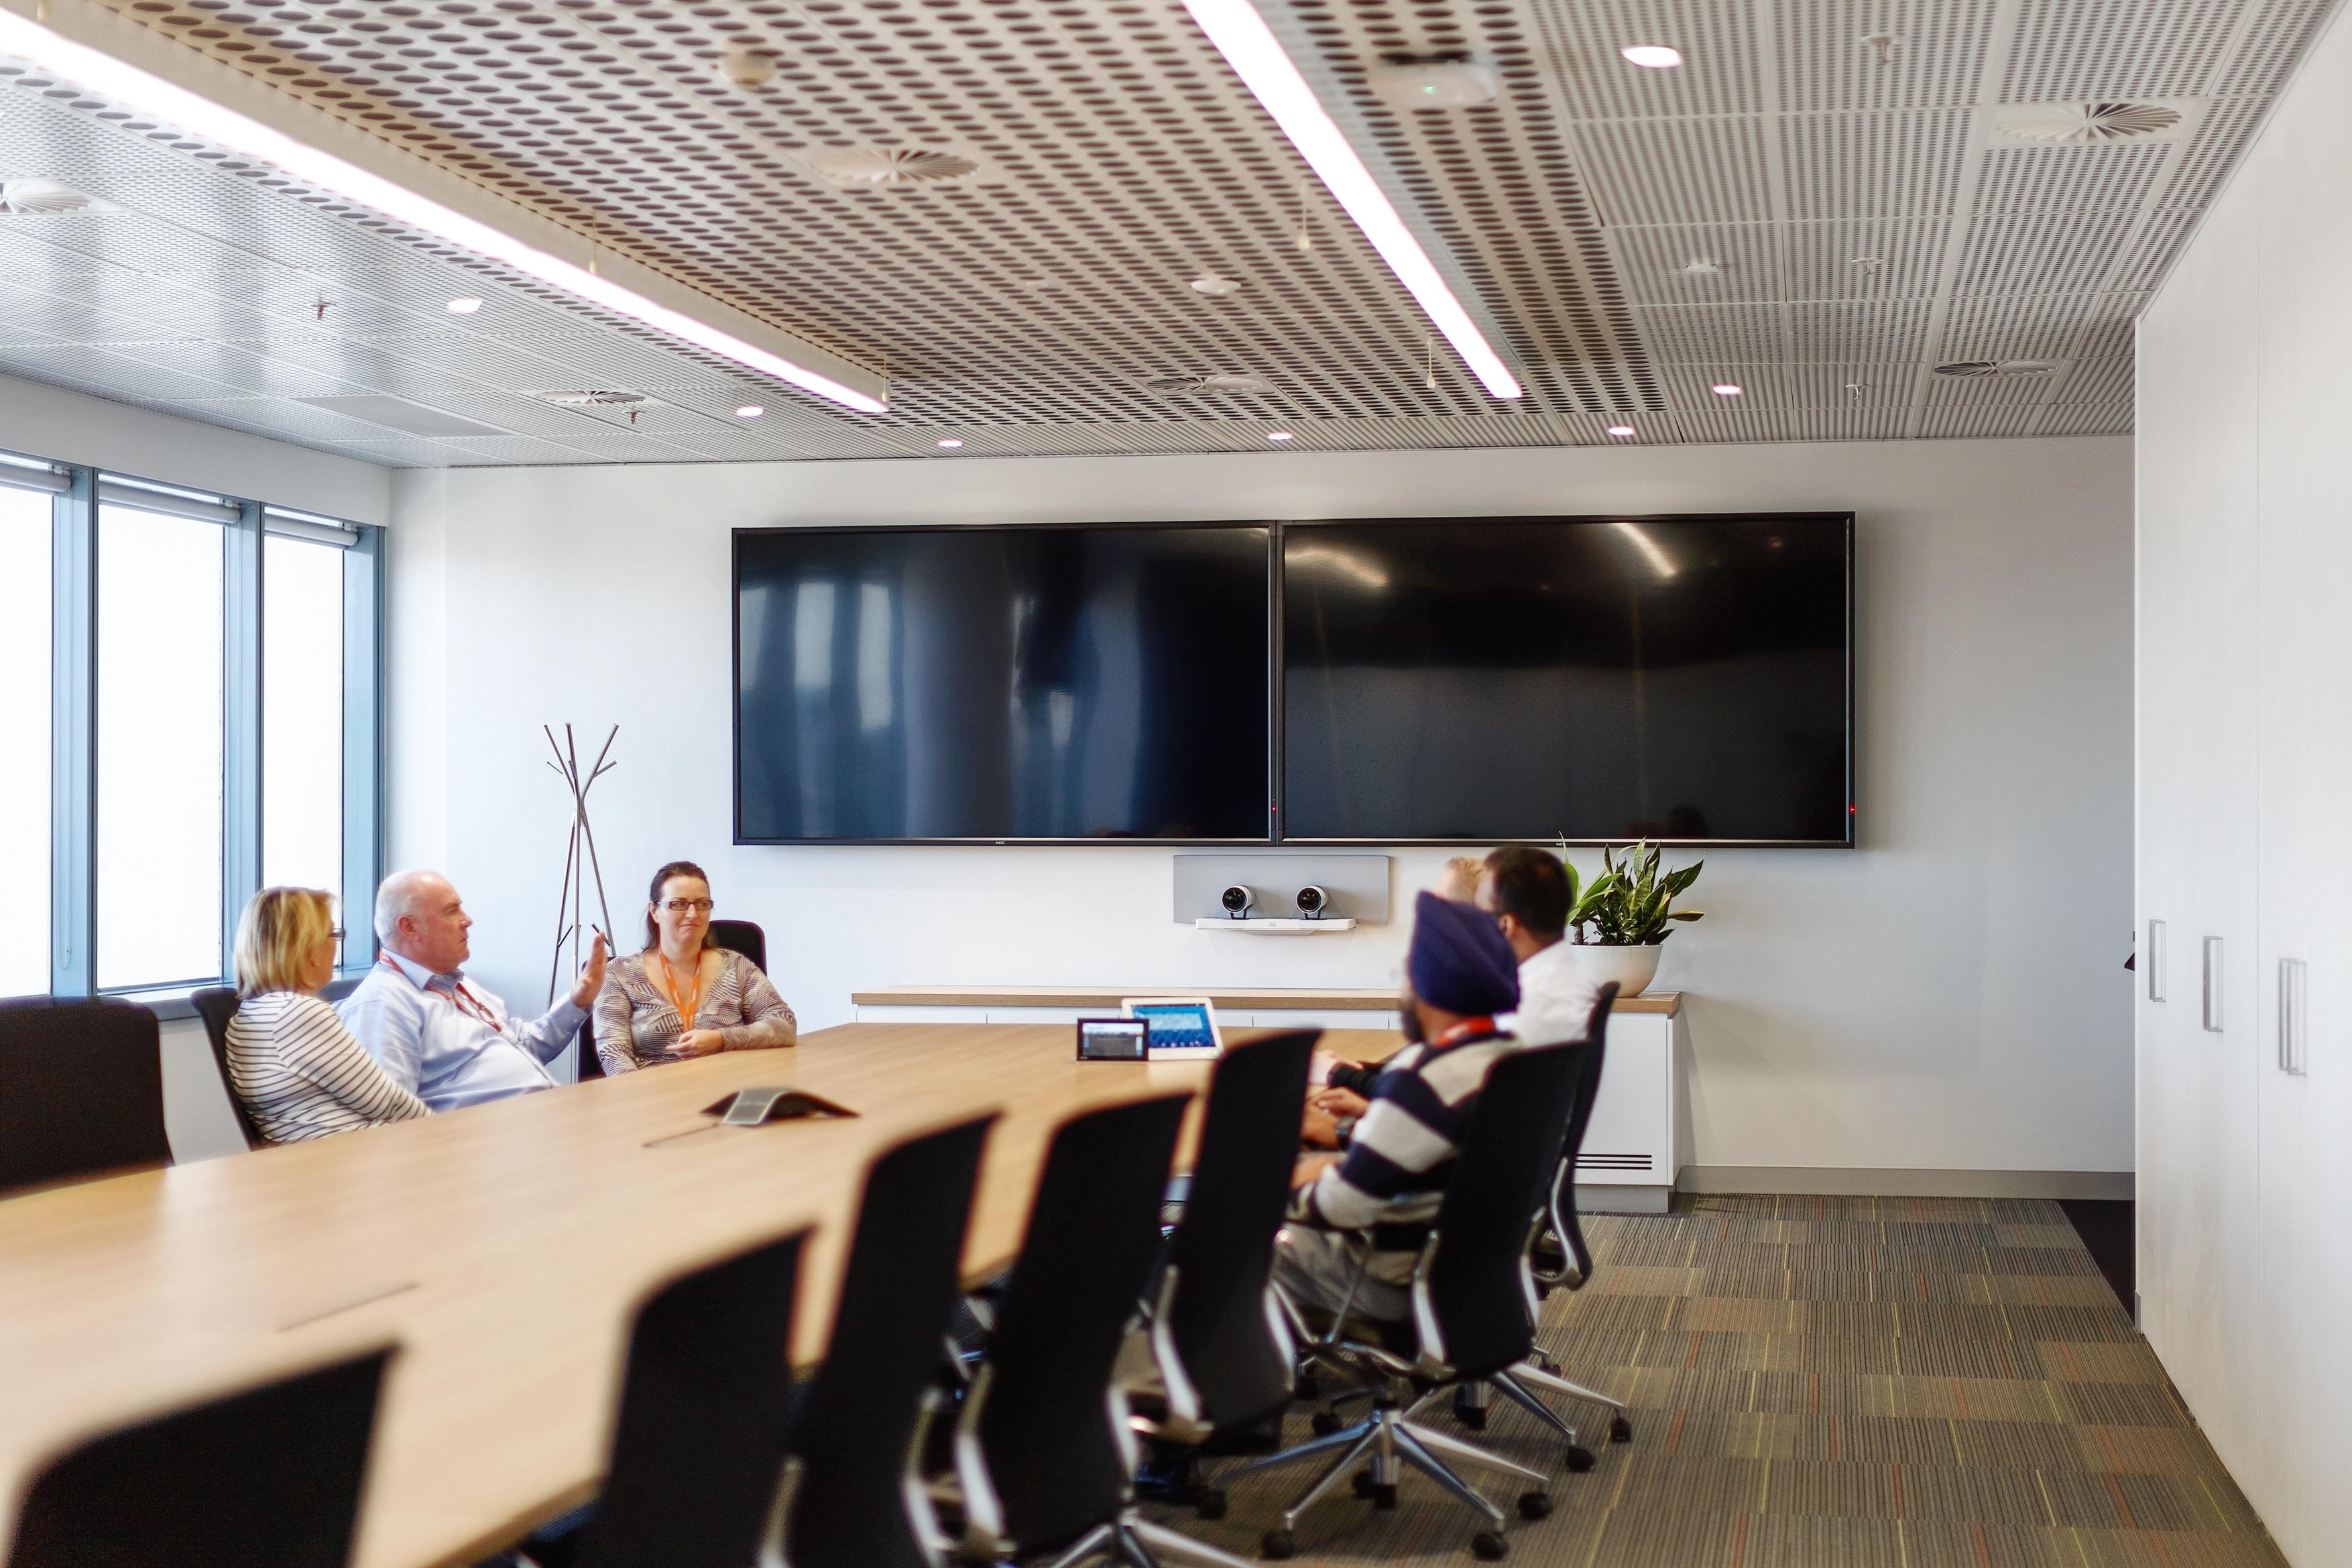 Hanson Paramatta Fitout Tenant Representation, Interior Design, Project & Construction Management Project Image 3 by PCG